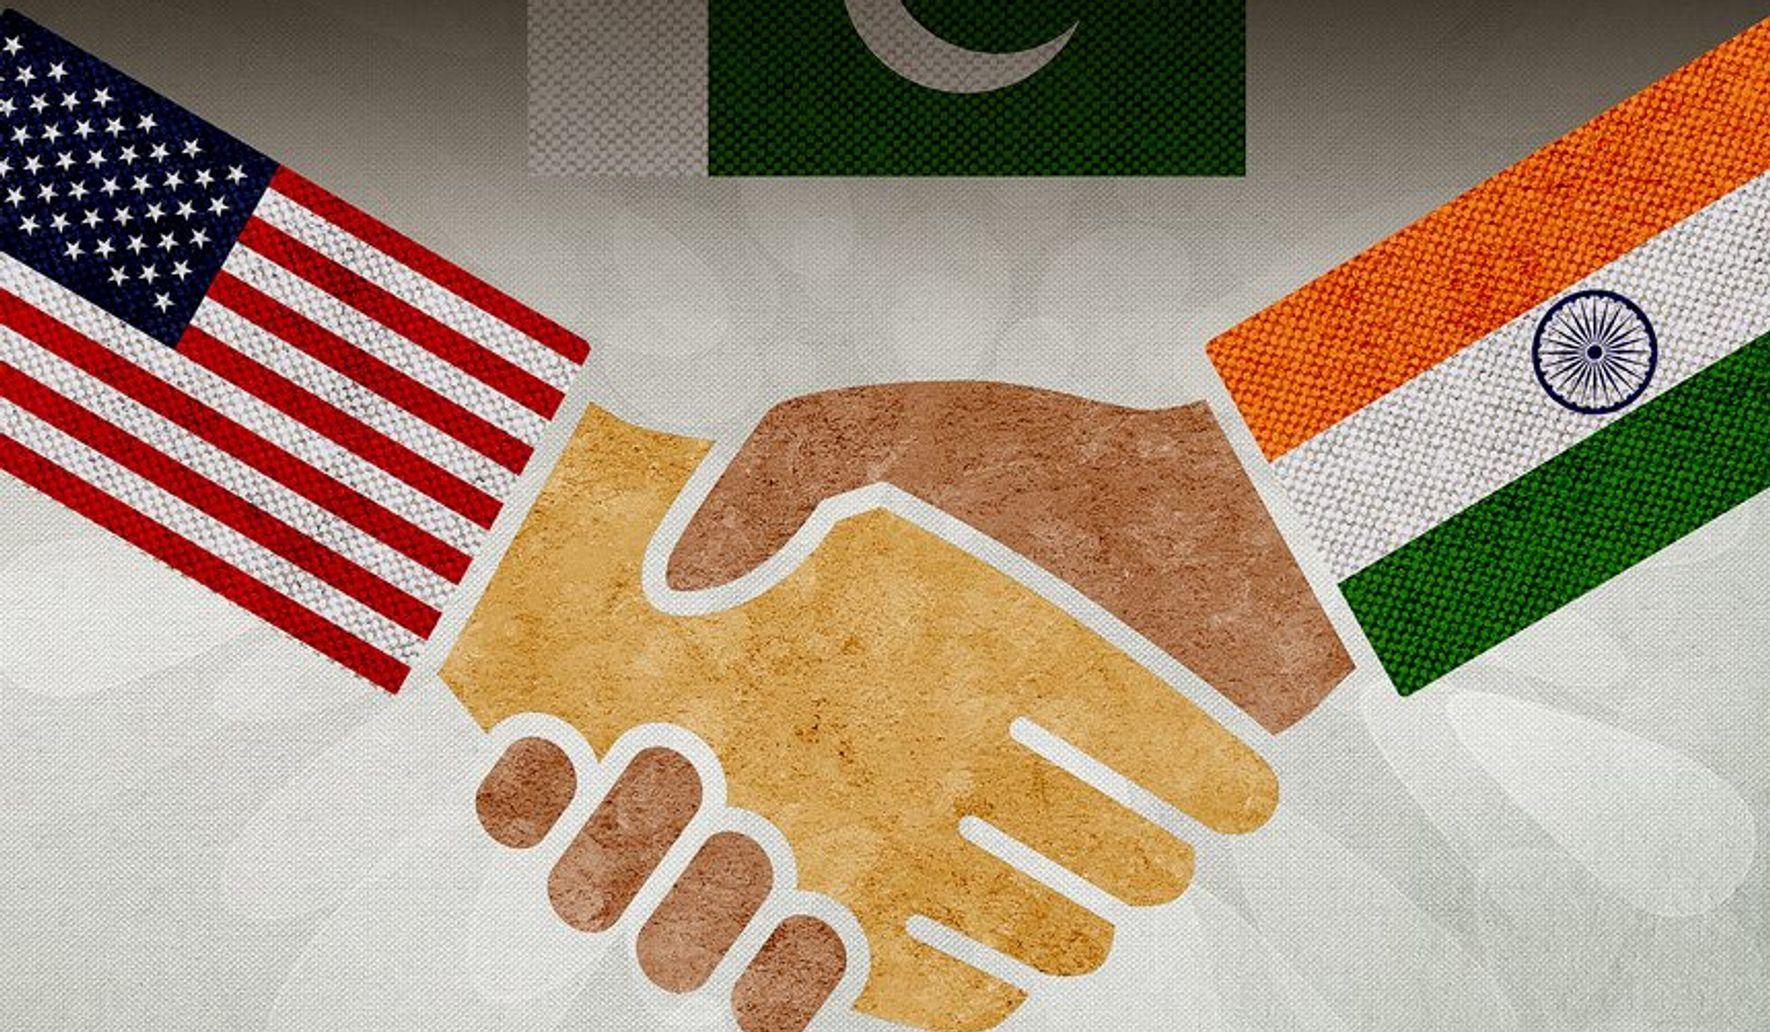 Prime Minister Khan threatens nuclear jihad over Kashmir